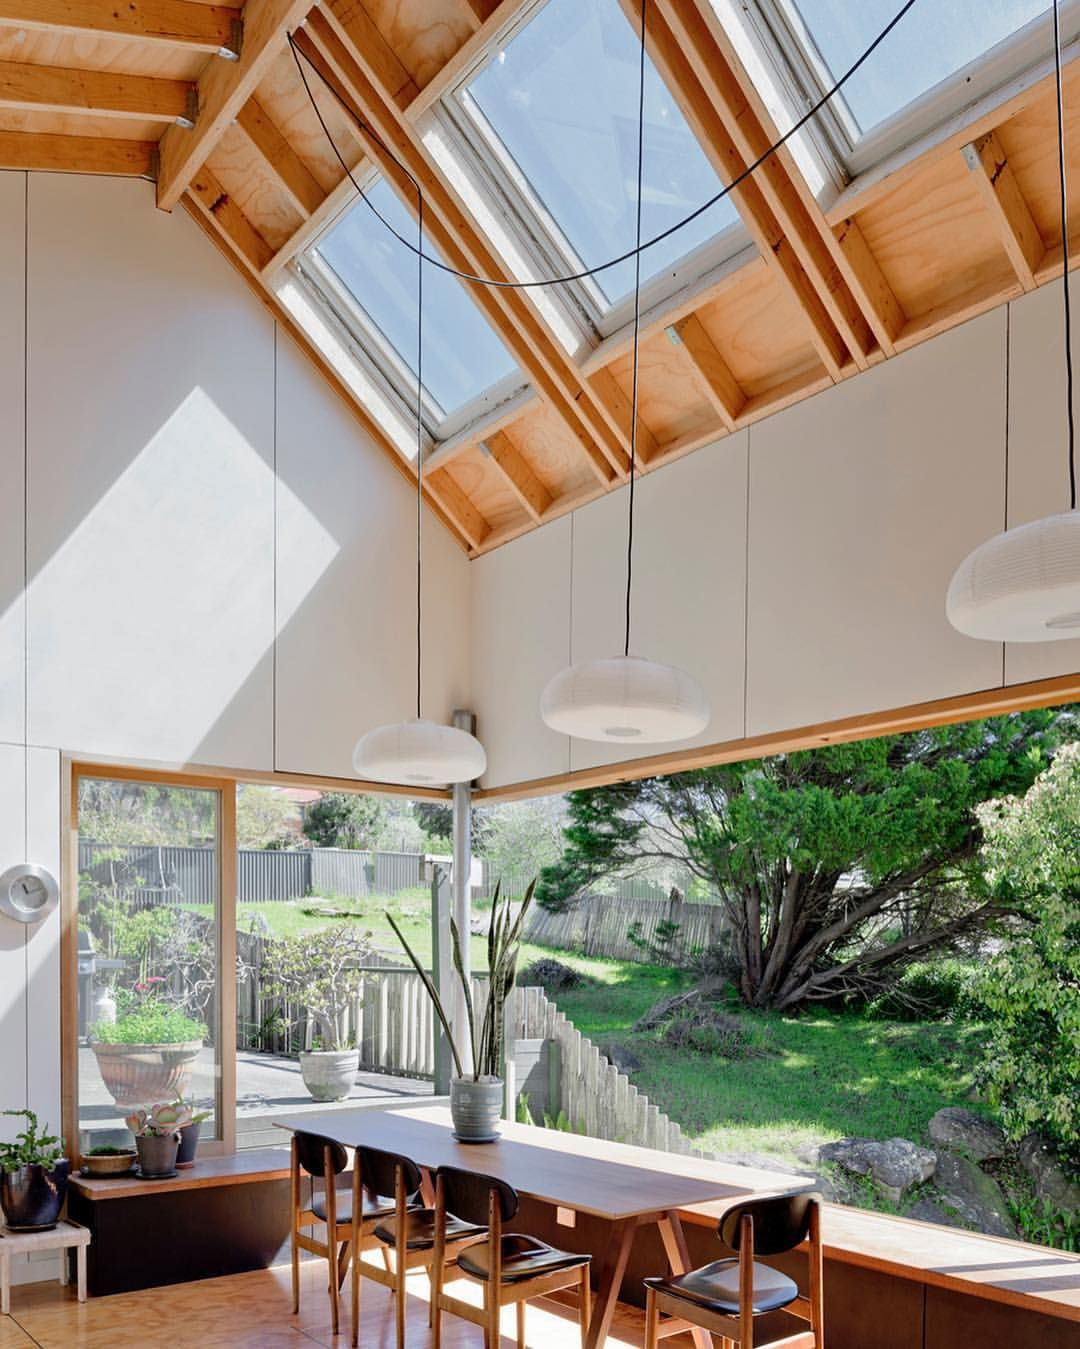 9 refined simple ideas roofing materials outdoor broken